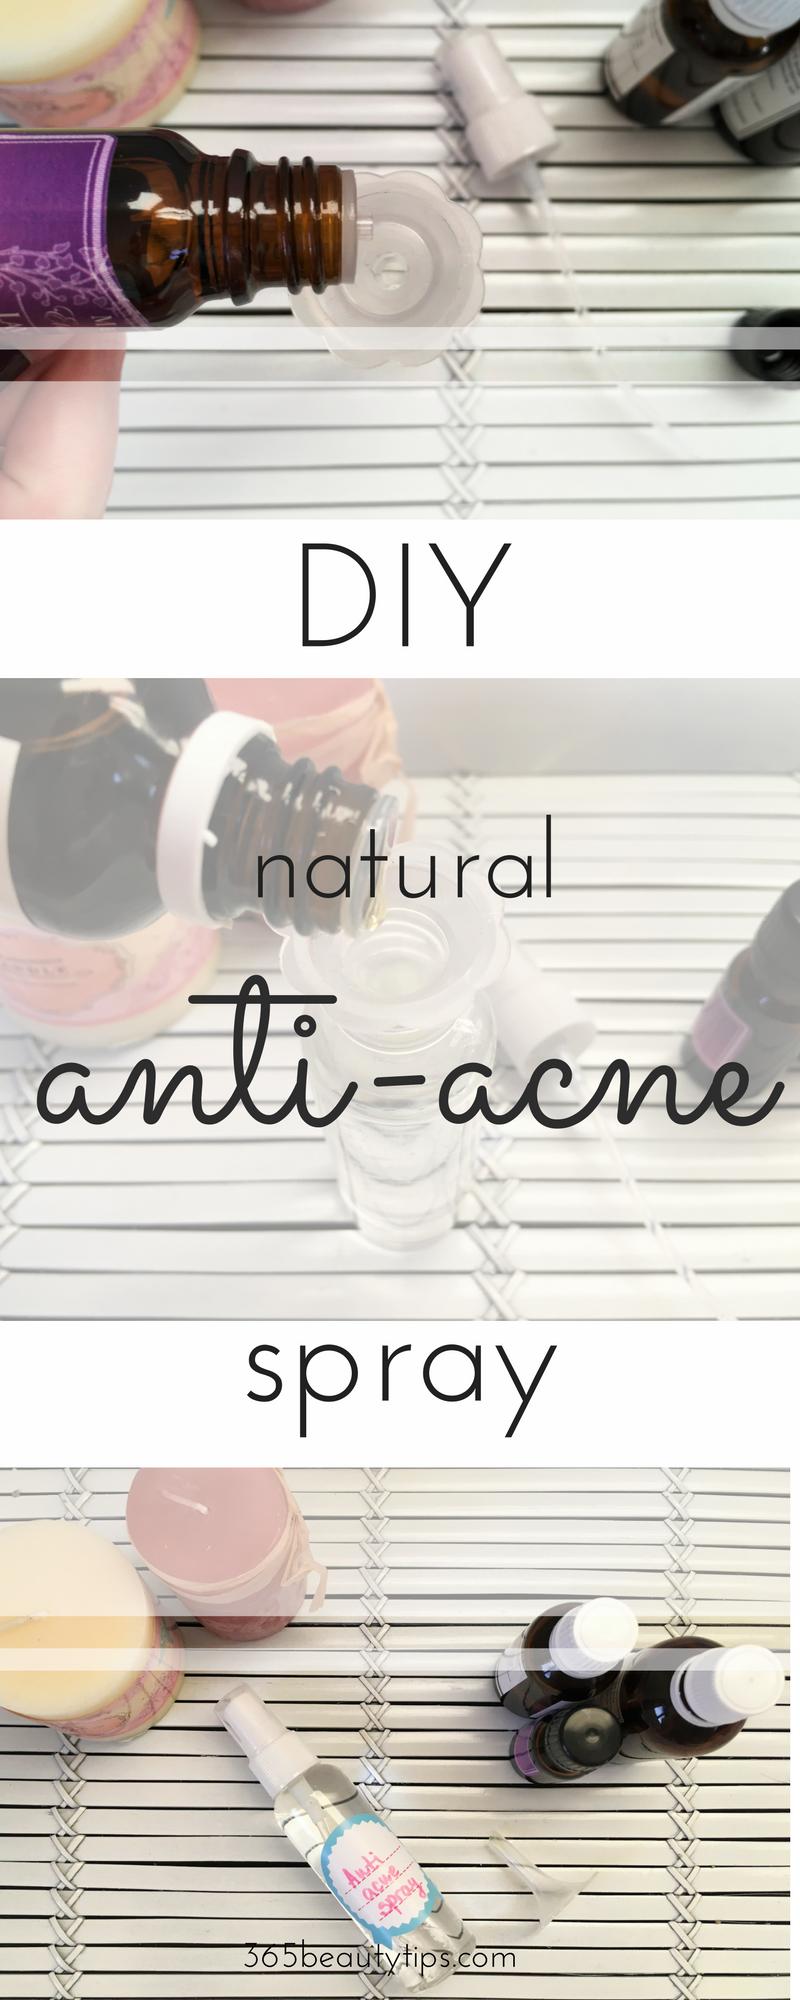 diy-anti-acne-spray-365-beauty-tips